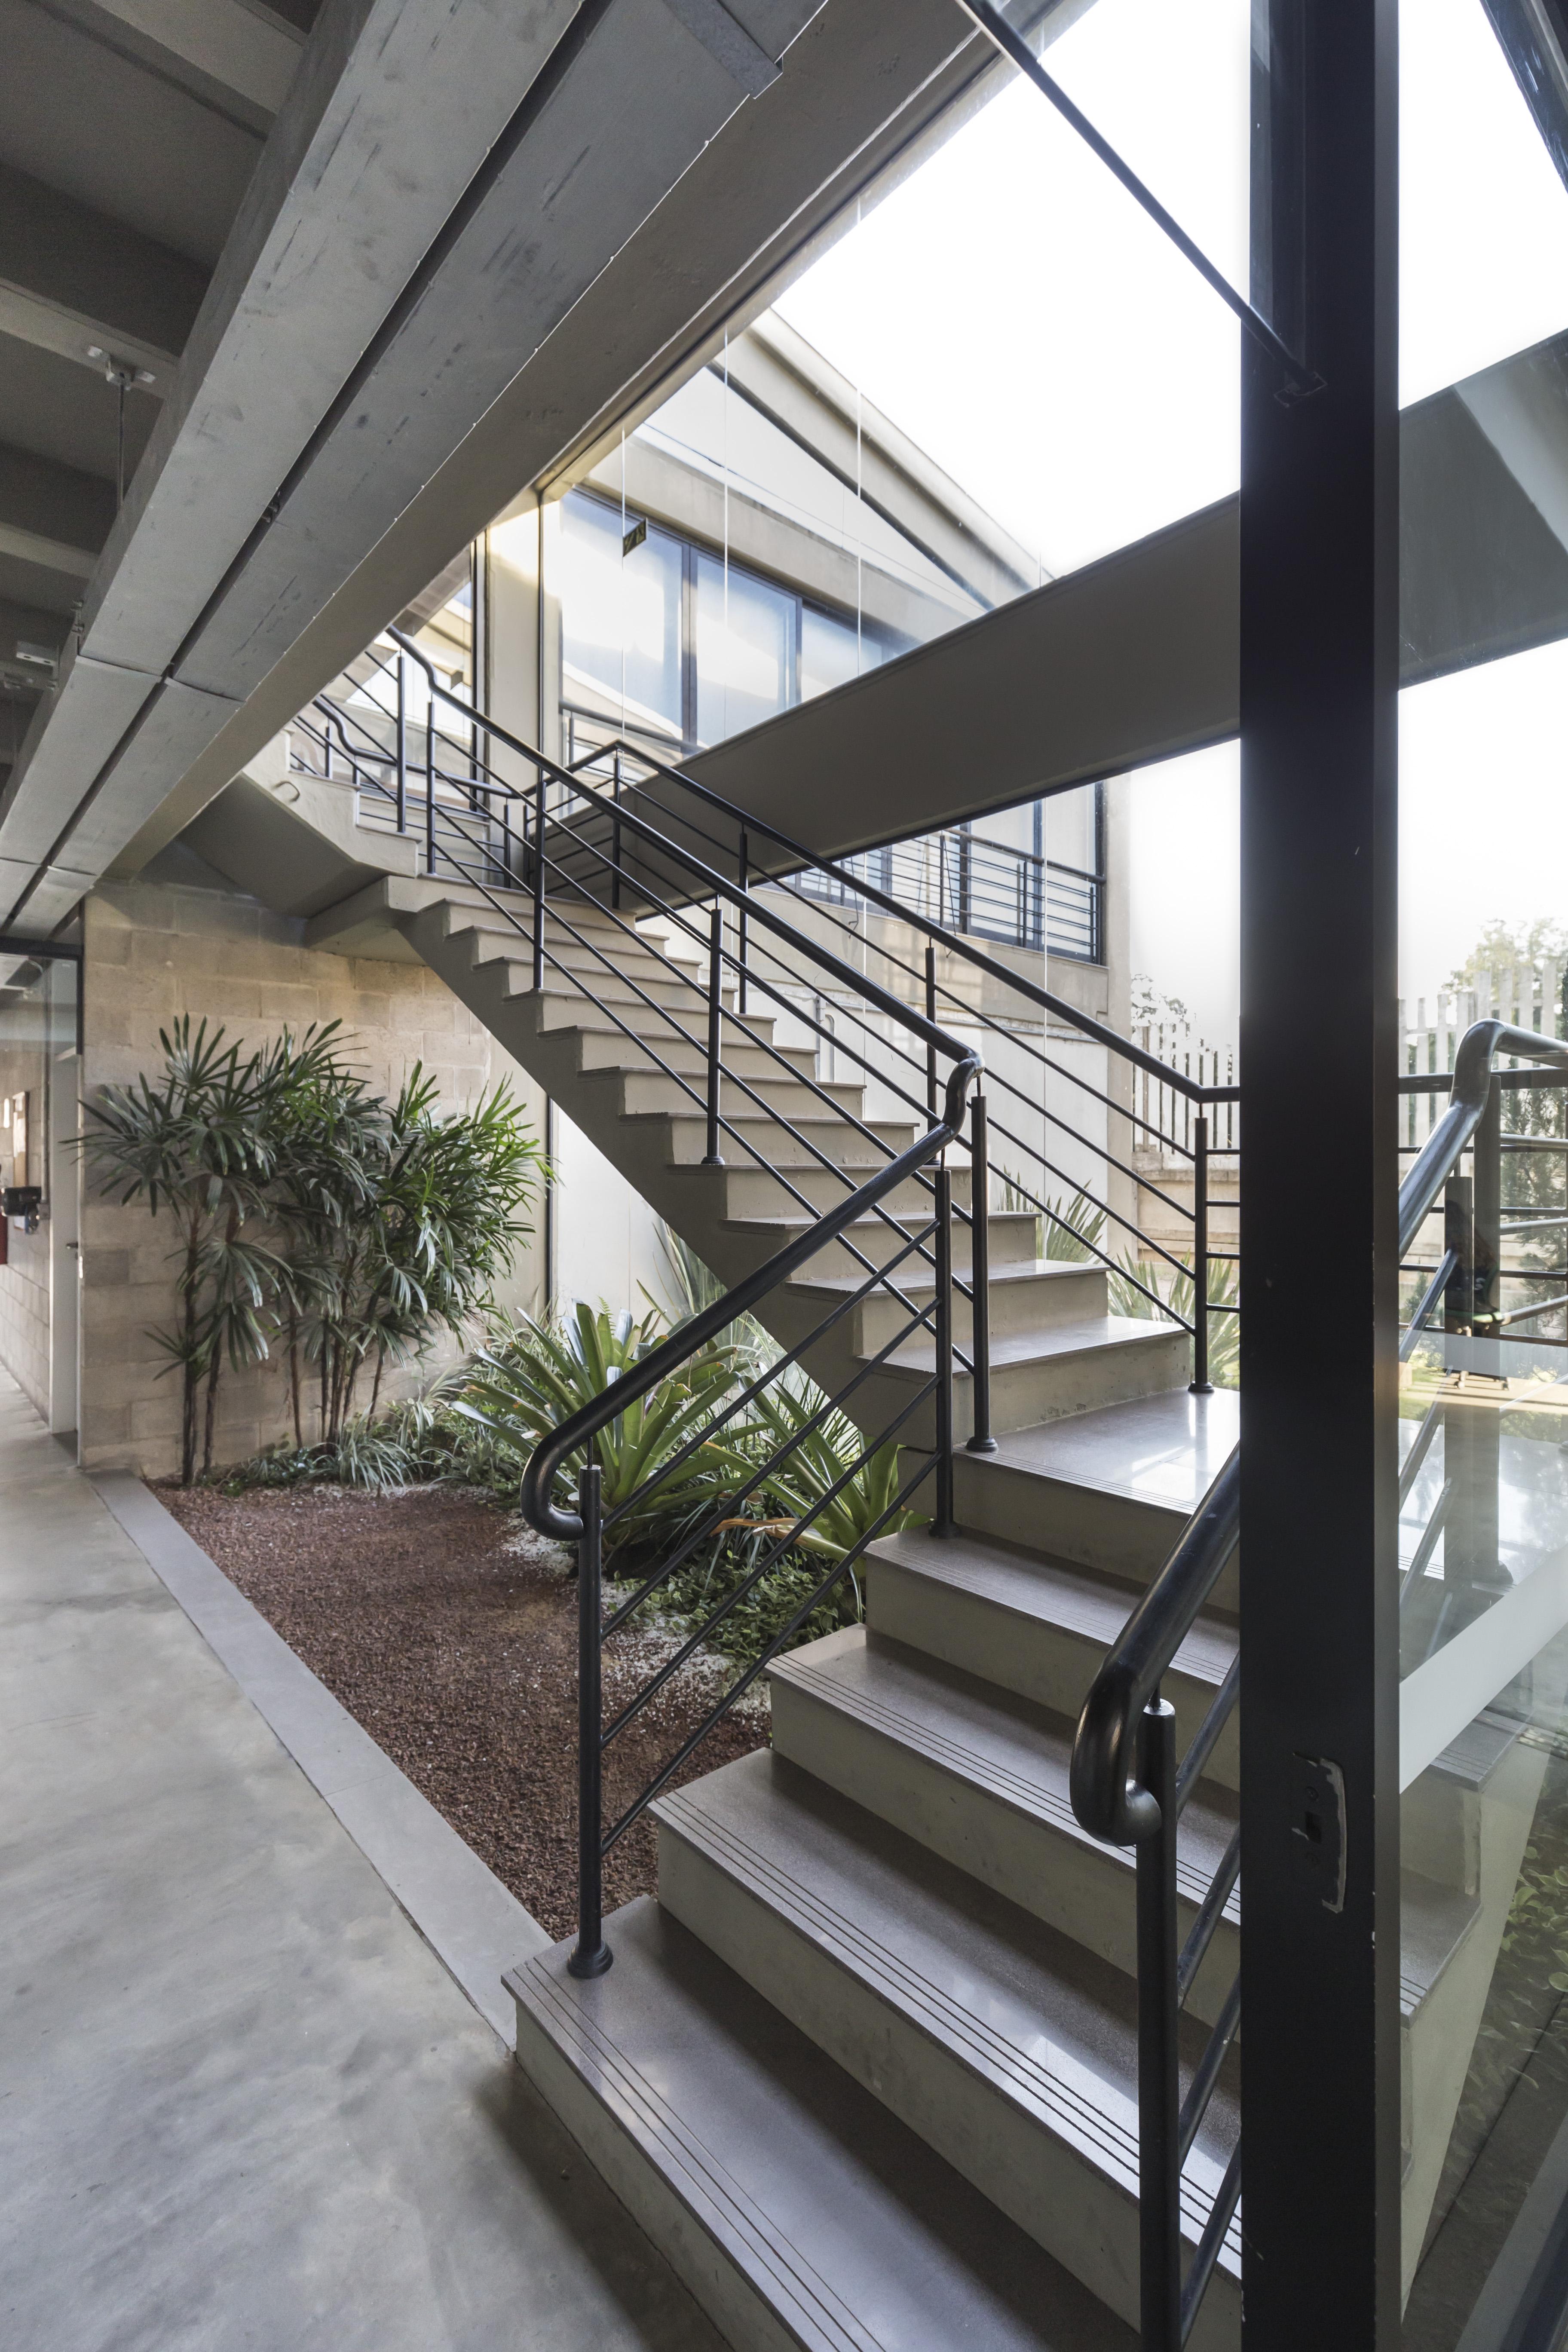 Engemold Headquarters - Stairs